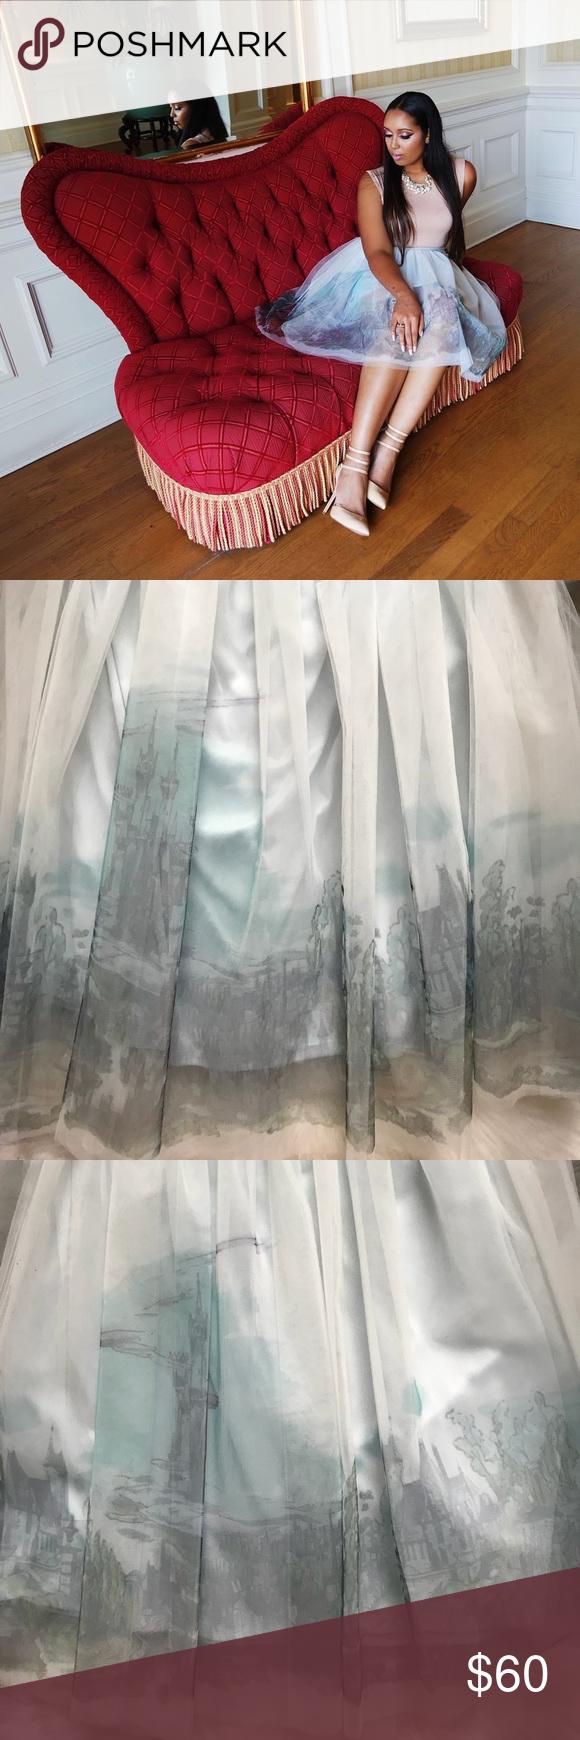 NWT LC Lauren Conrad Tulle Cinderella Skirt L   Lauren